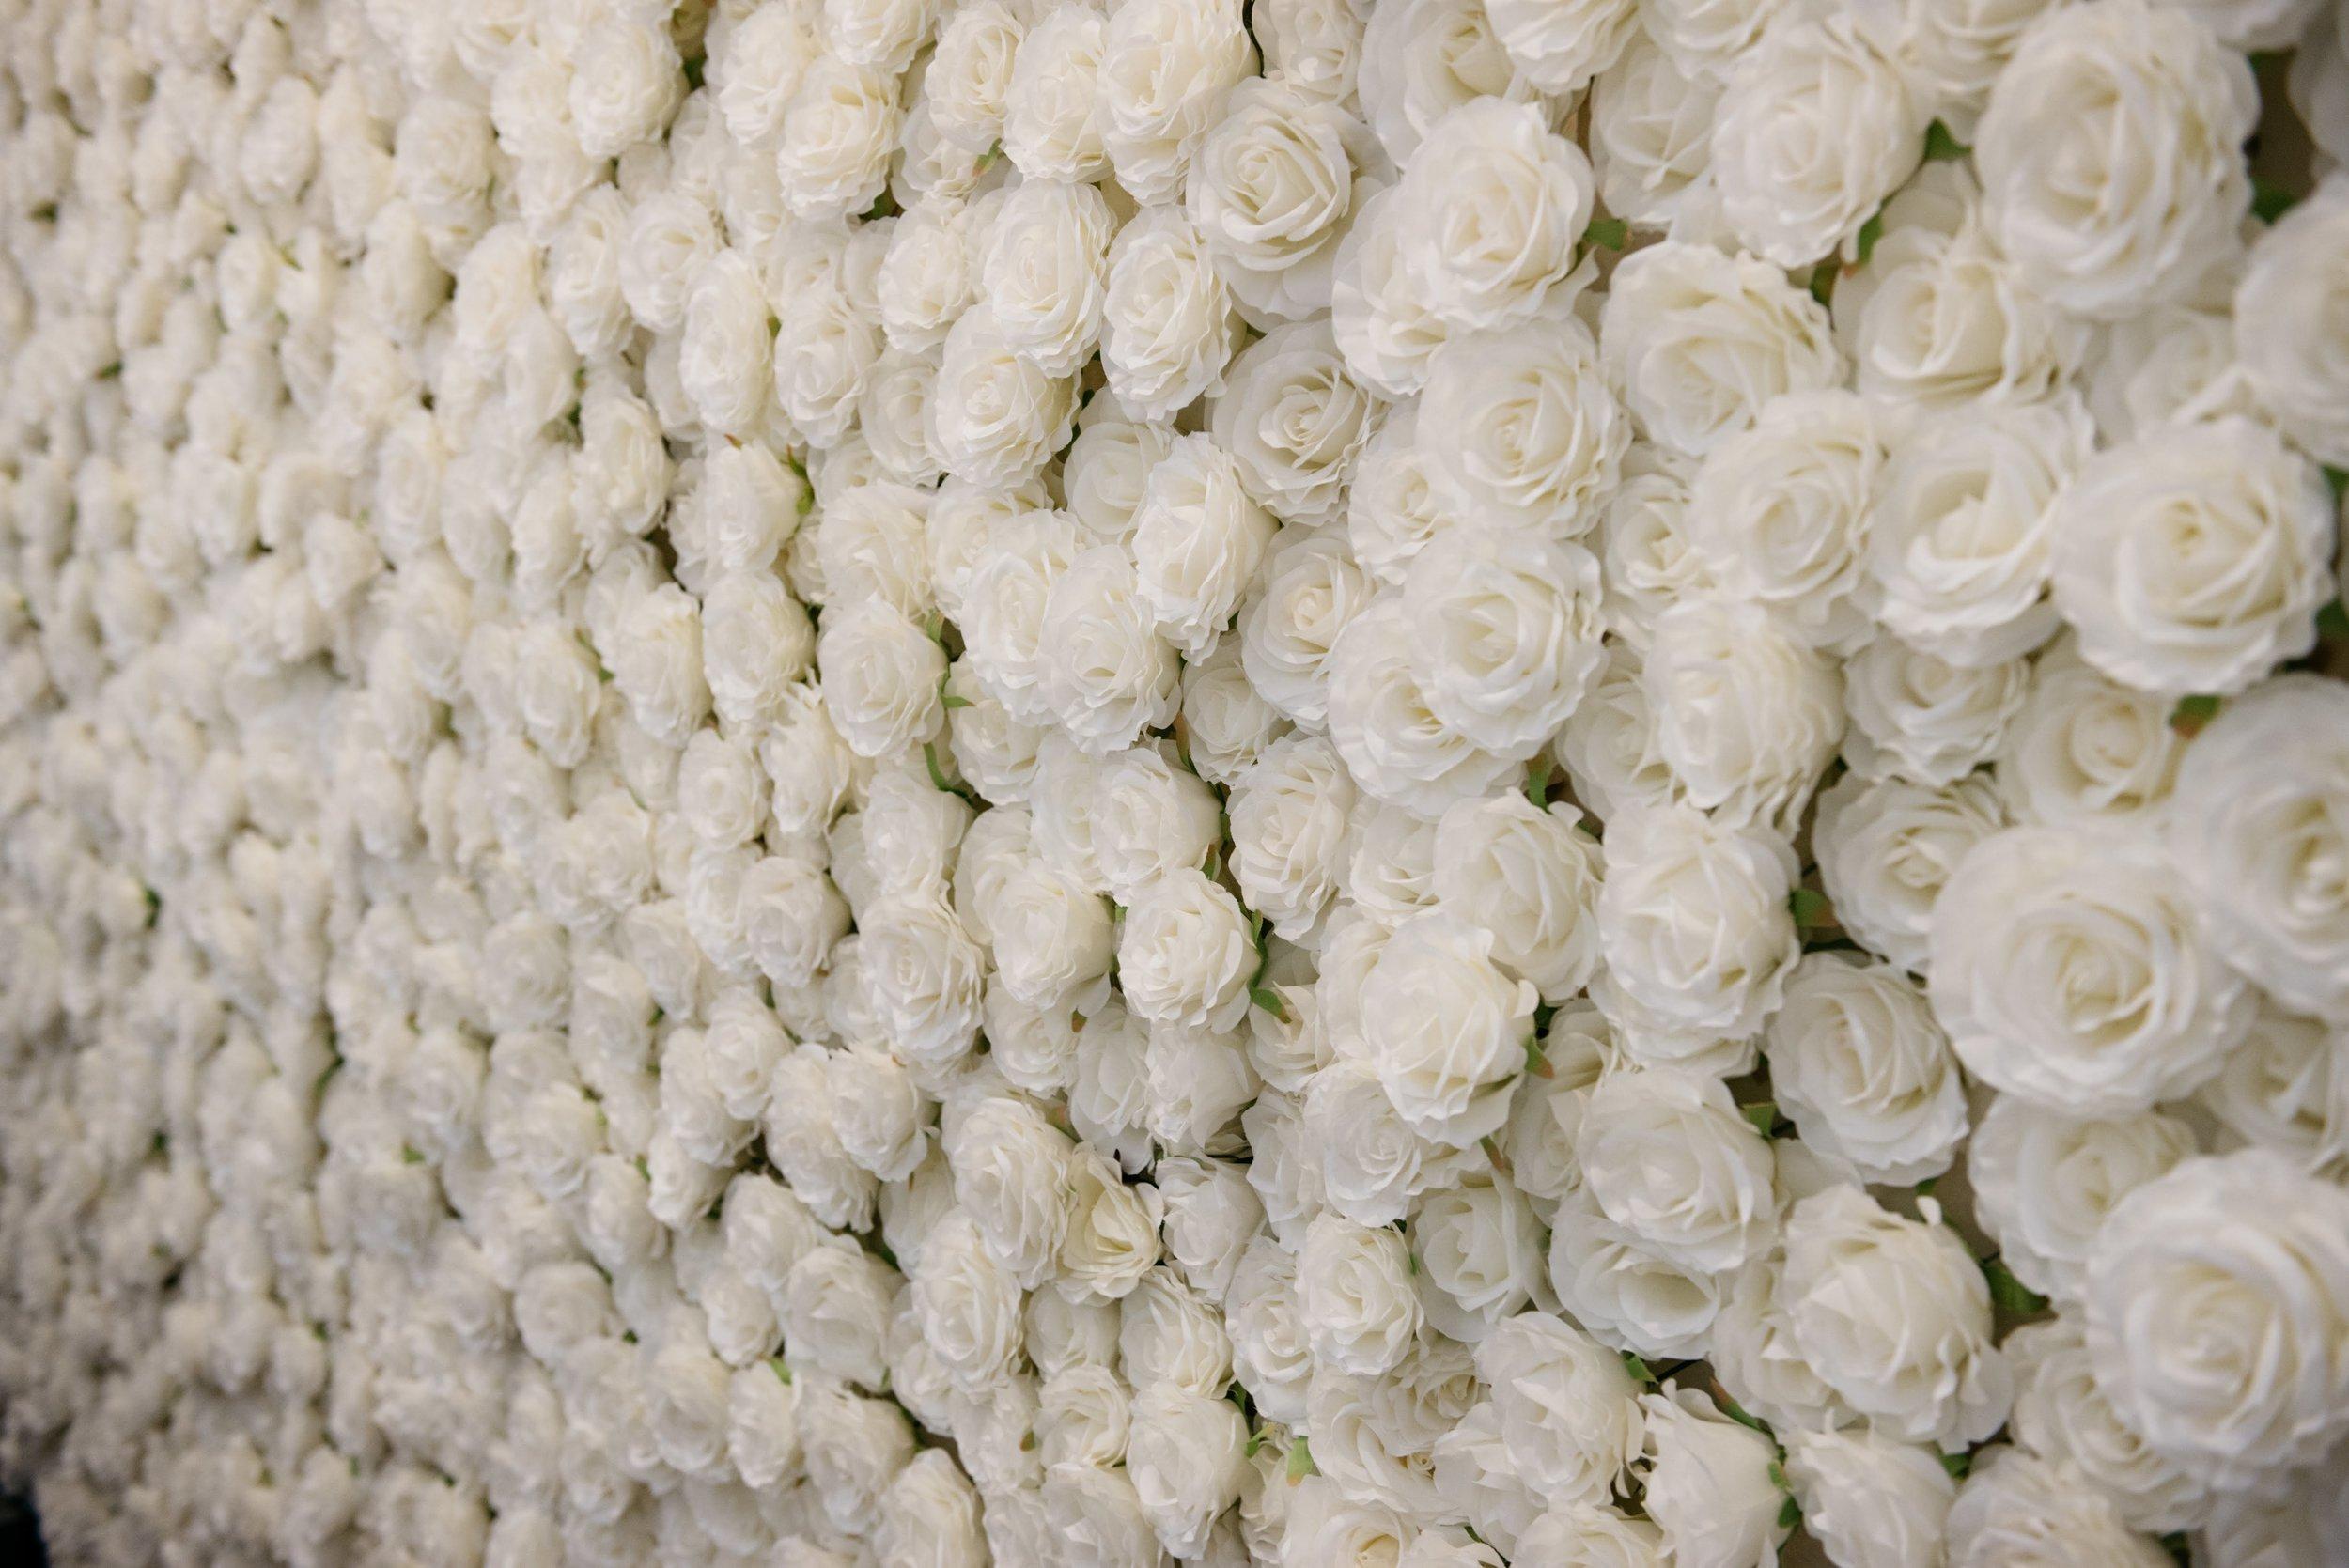 Real Wedding at Summergrove Estate Barn, Hampton Event Hire Blog, Flower Wall